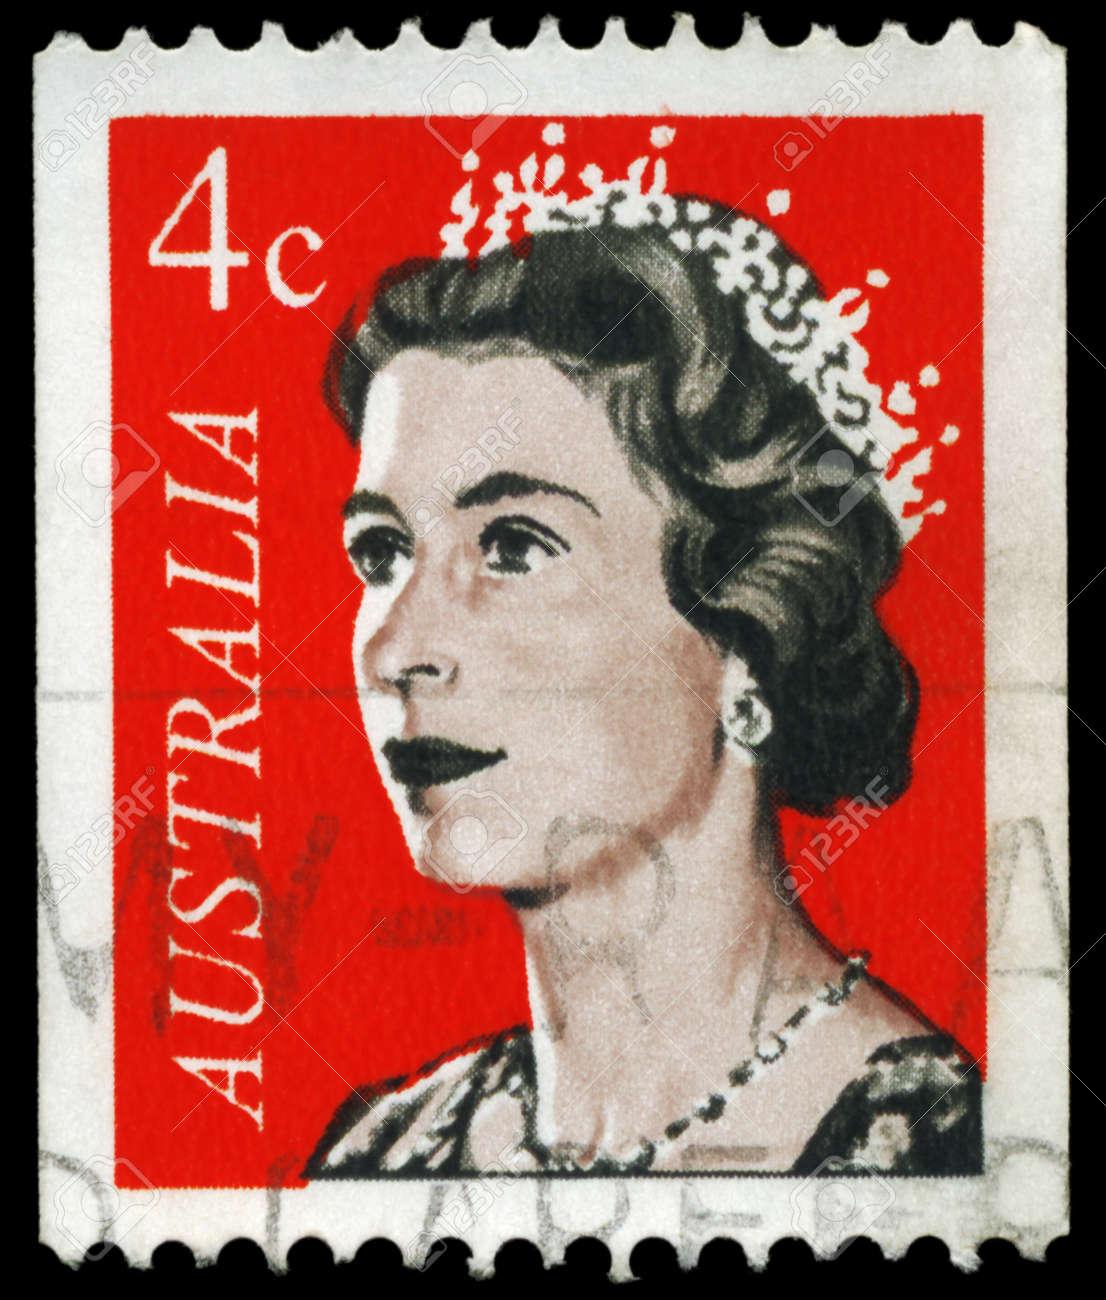 AUSTRALIA - CIRCA 1966: A Stamp printed in AUSTRALIA shows the portrait of a Queen Elizabeth II, series, circa 1966 Stock Photo - 16375795